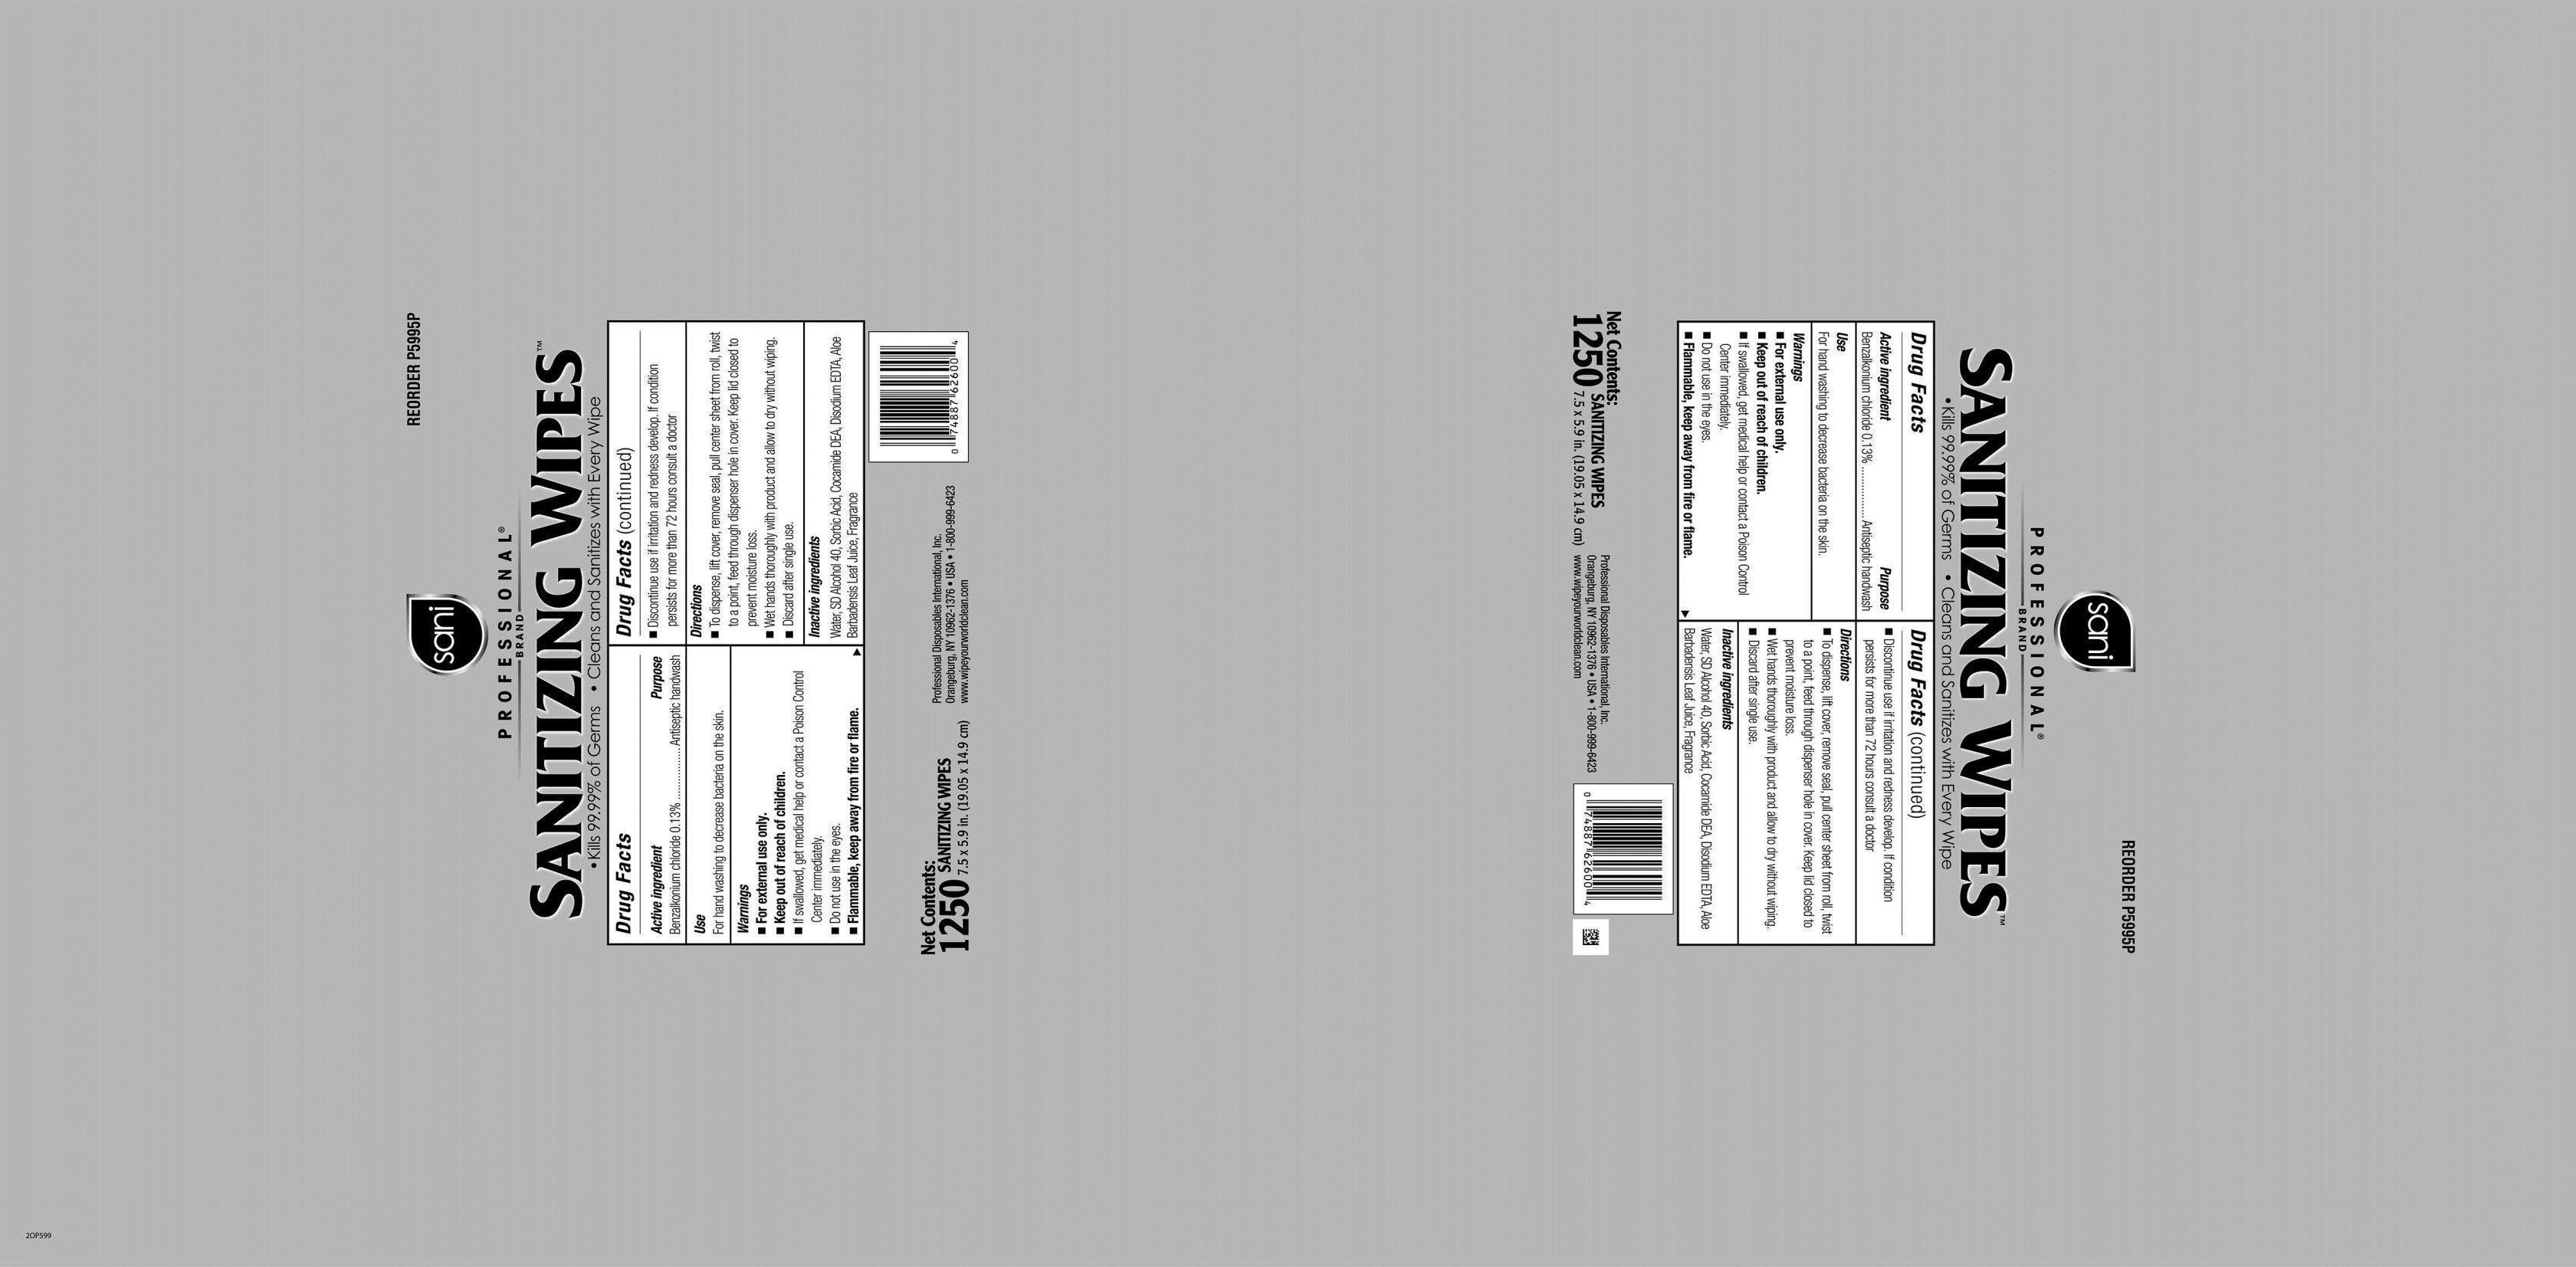 Image of bag label